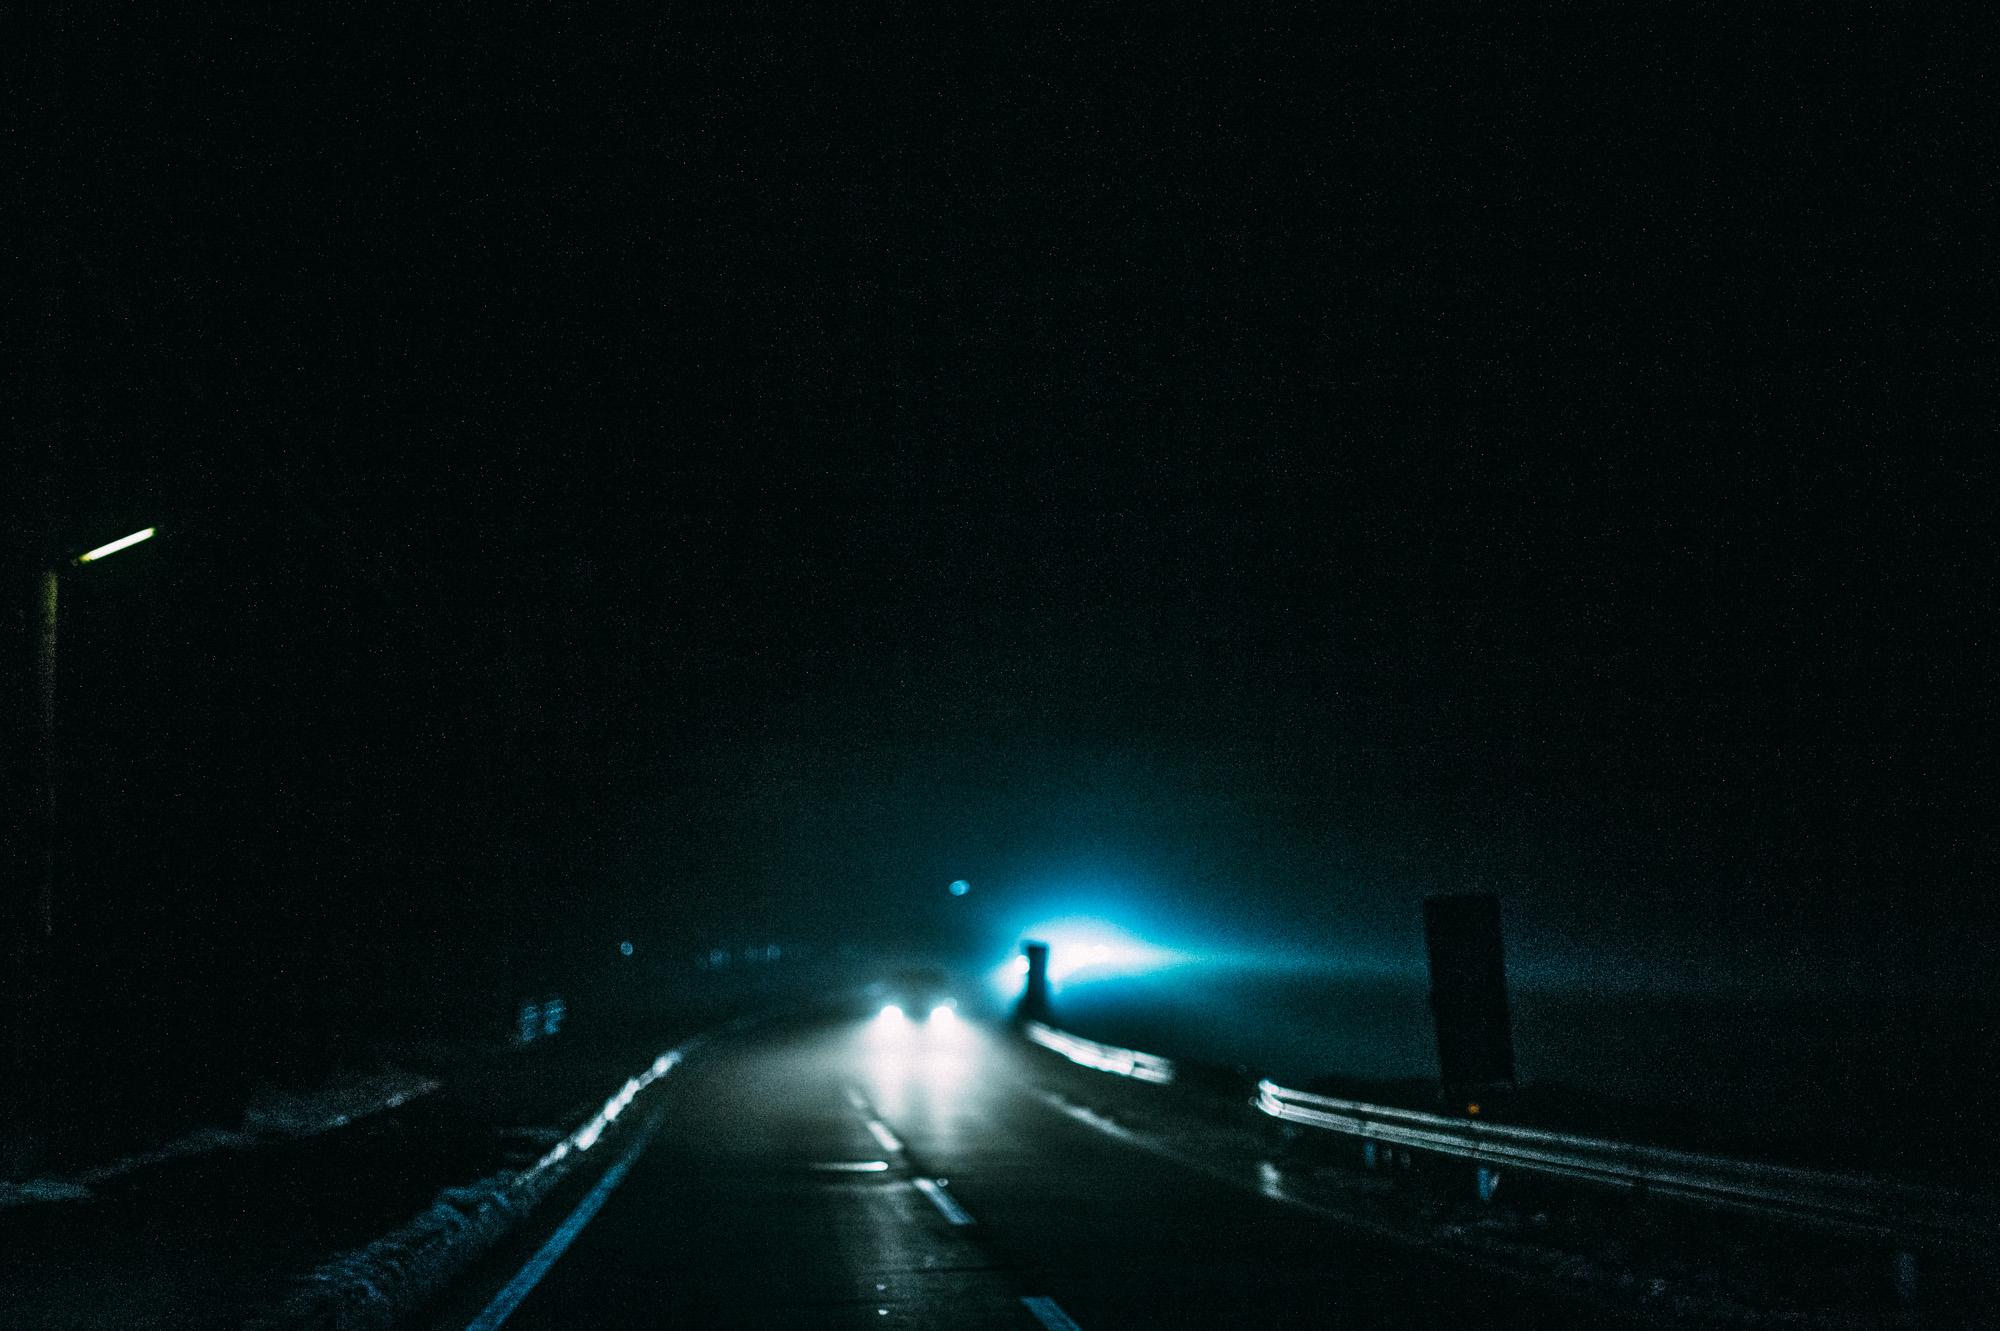 福知山前撮り11